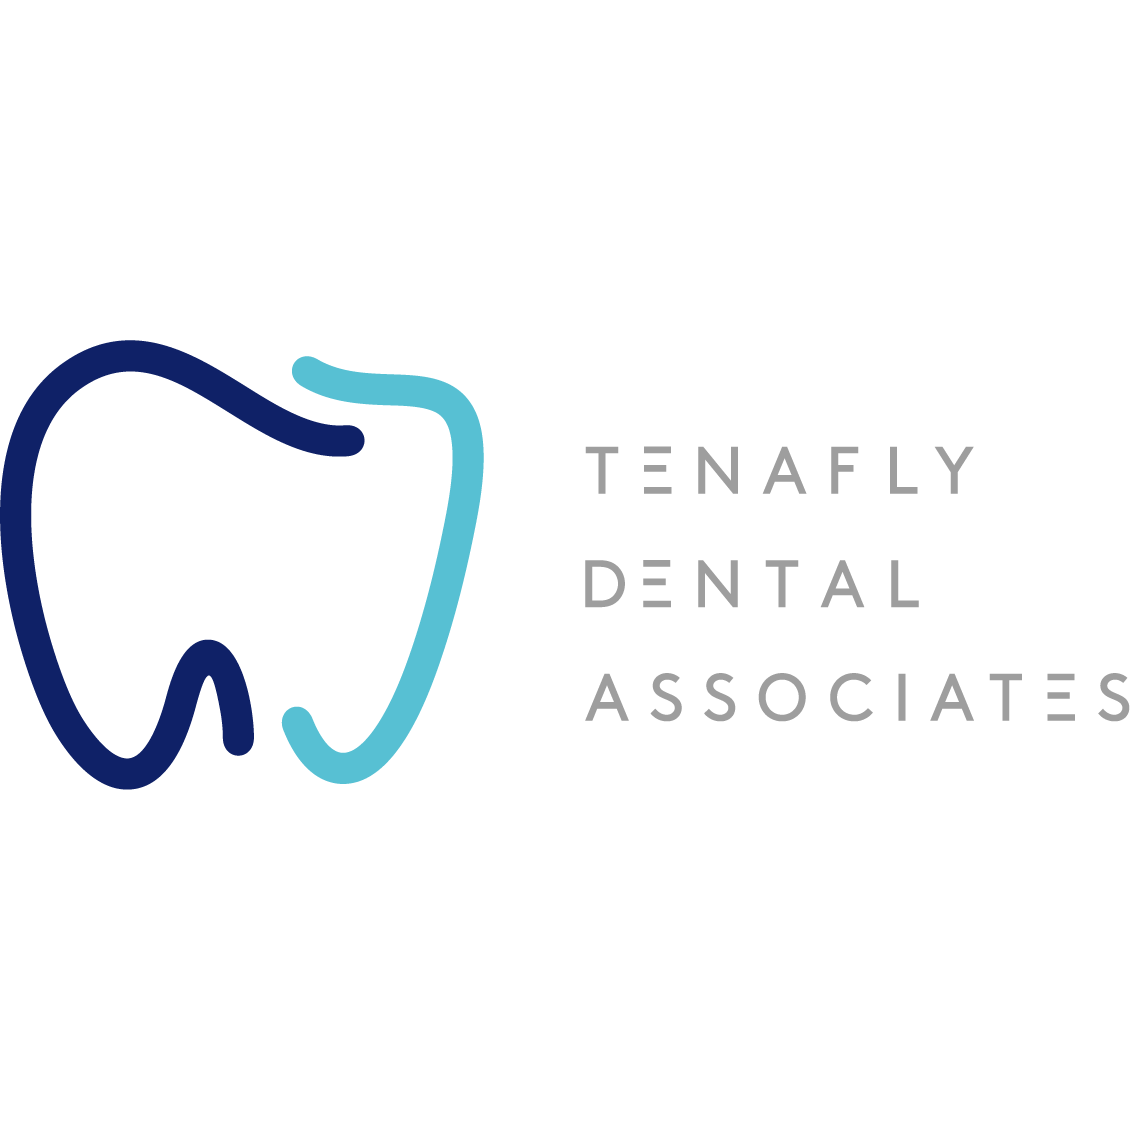 Tenafly Dental Associates - Tenafly, NJ - Dentists & Dental Services